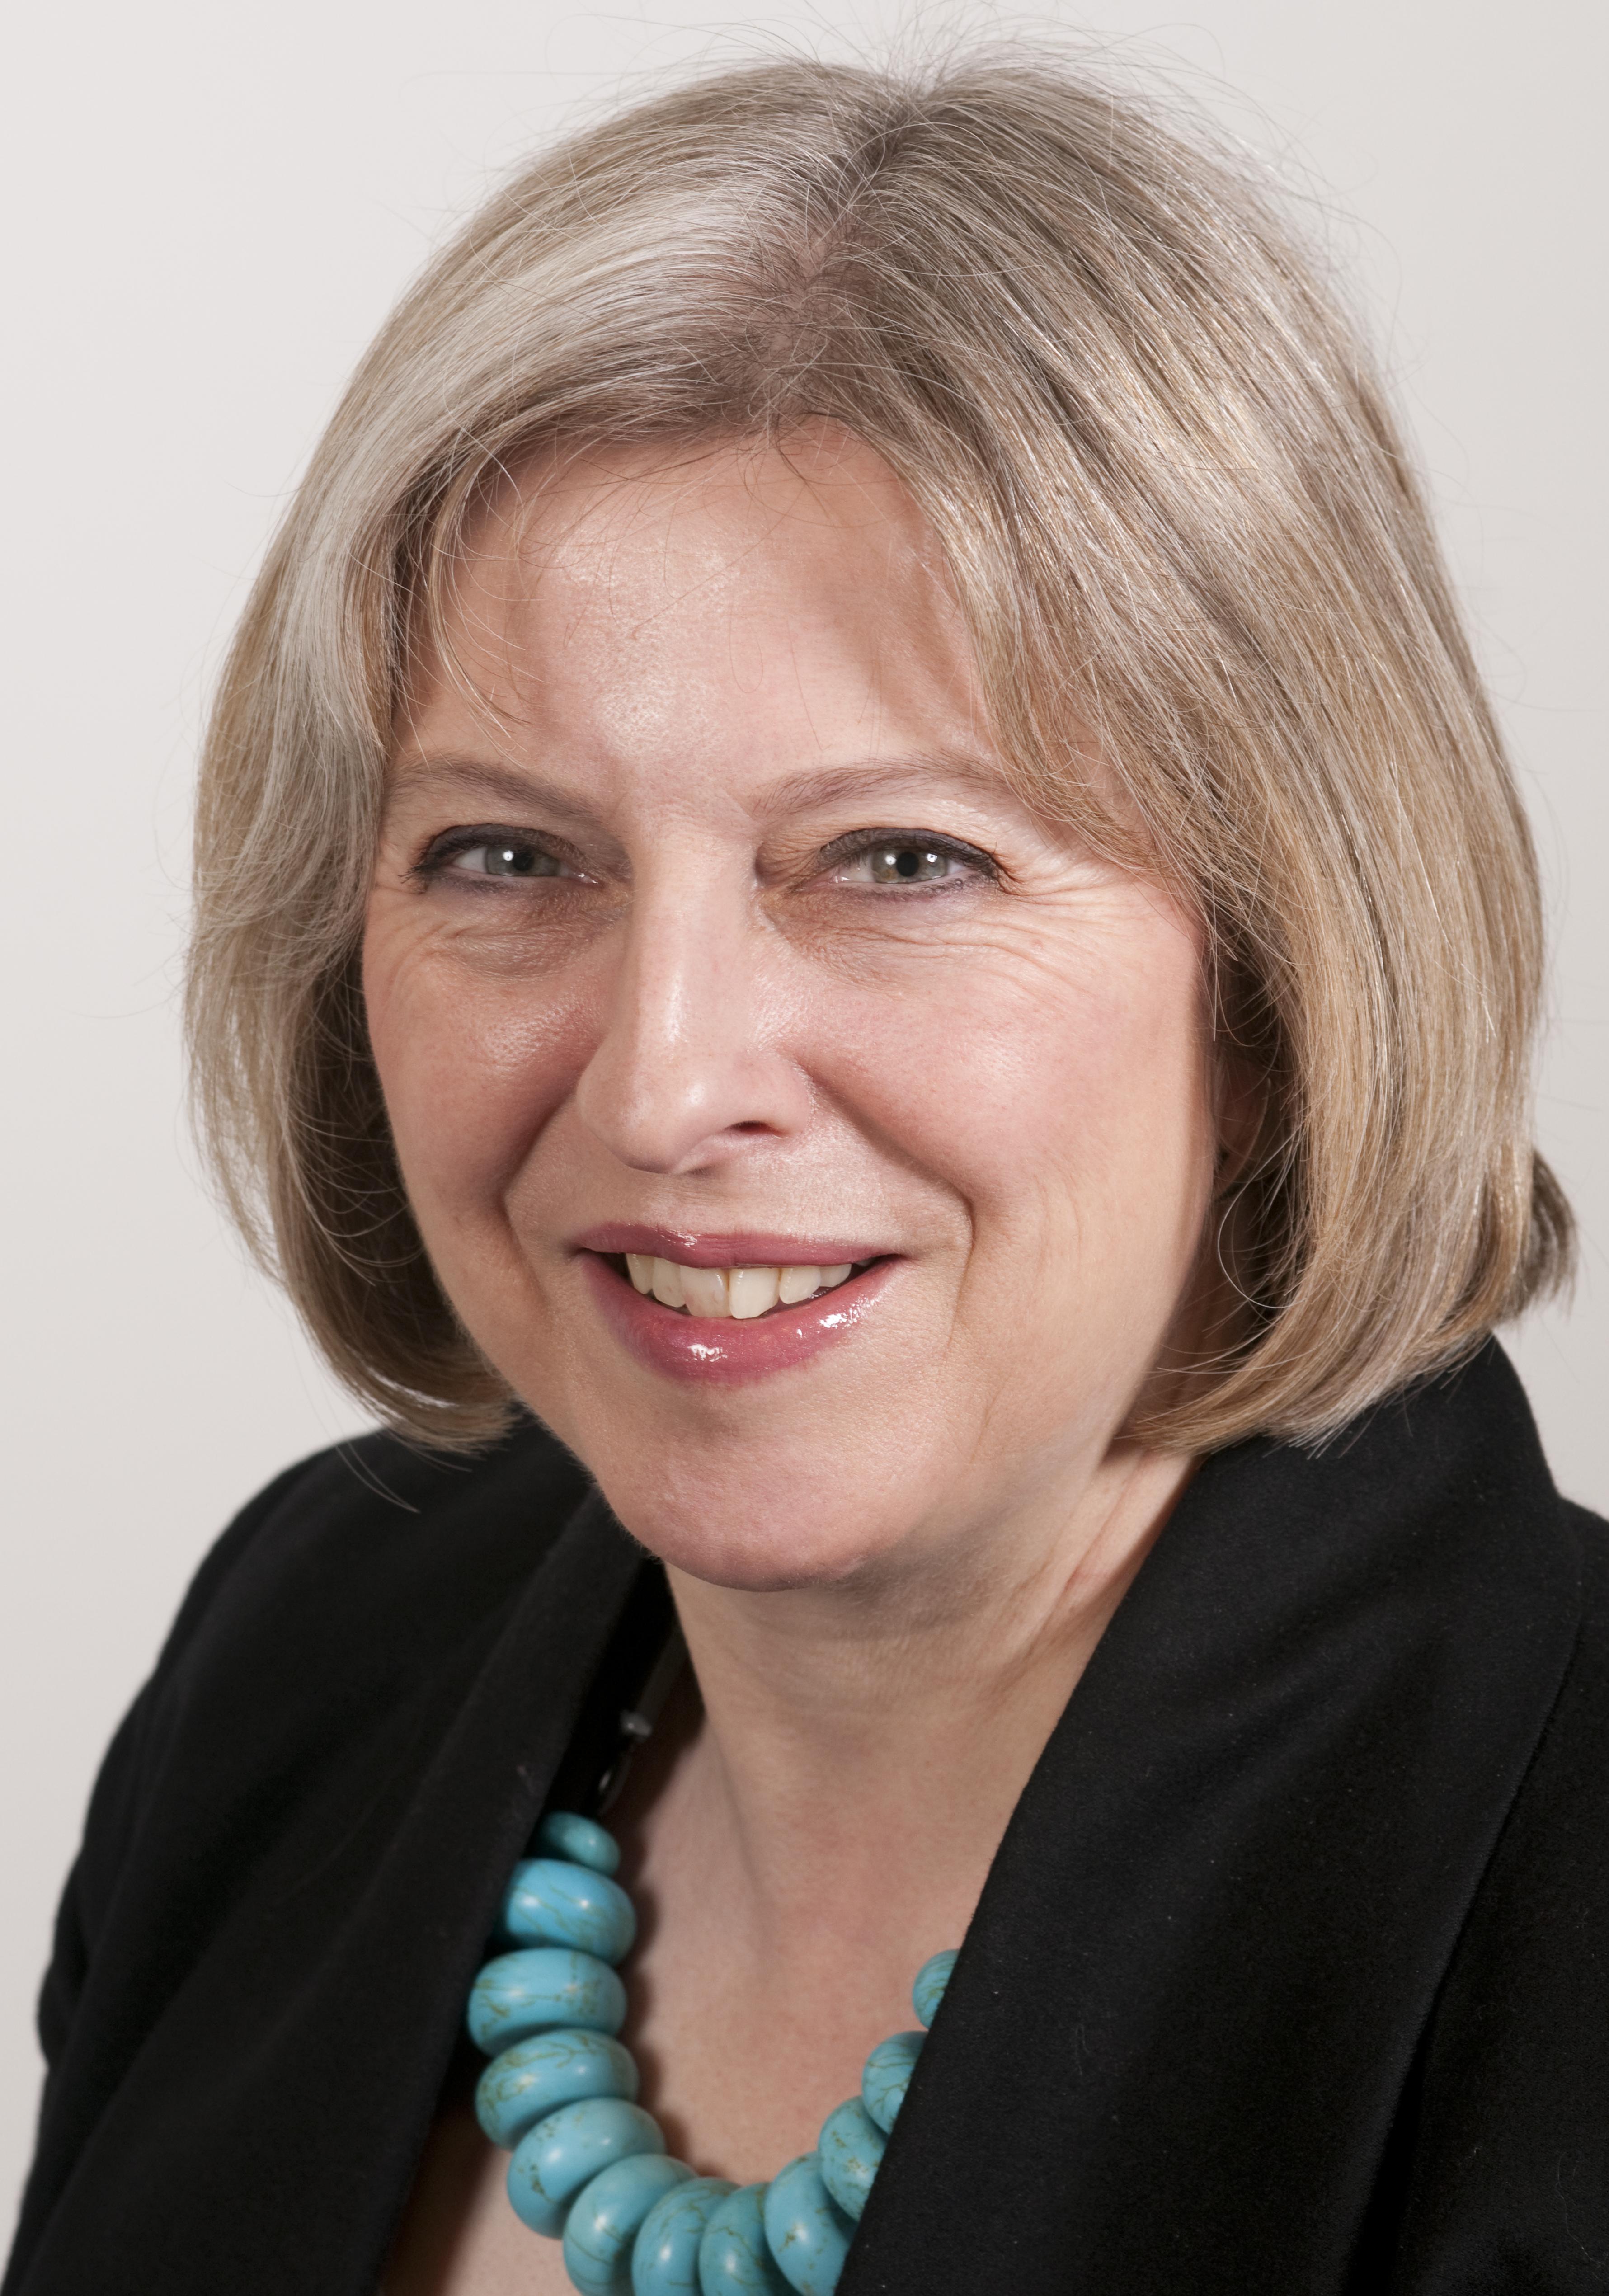 Poet Theresa May